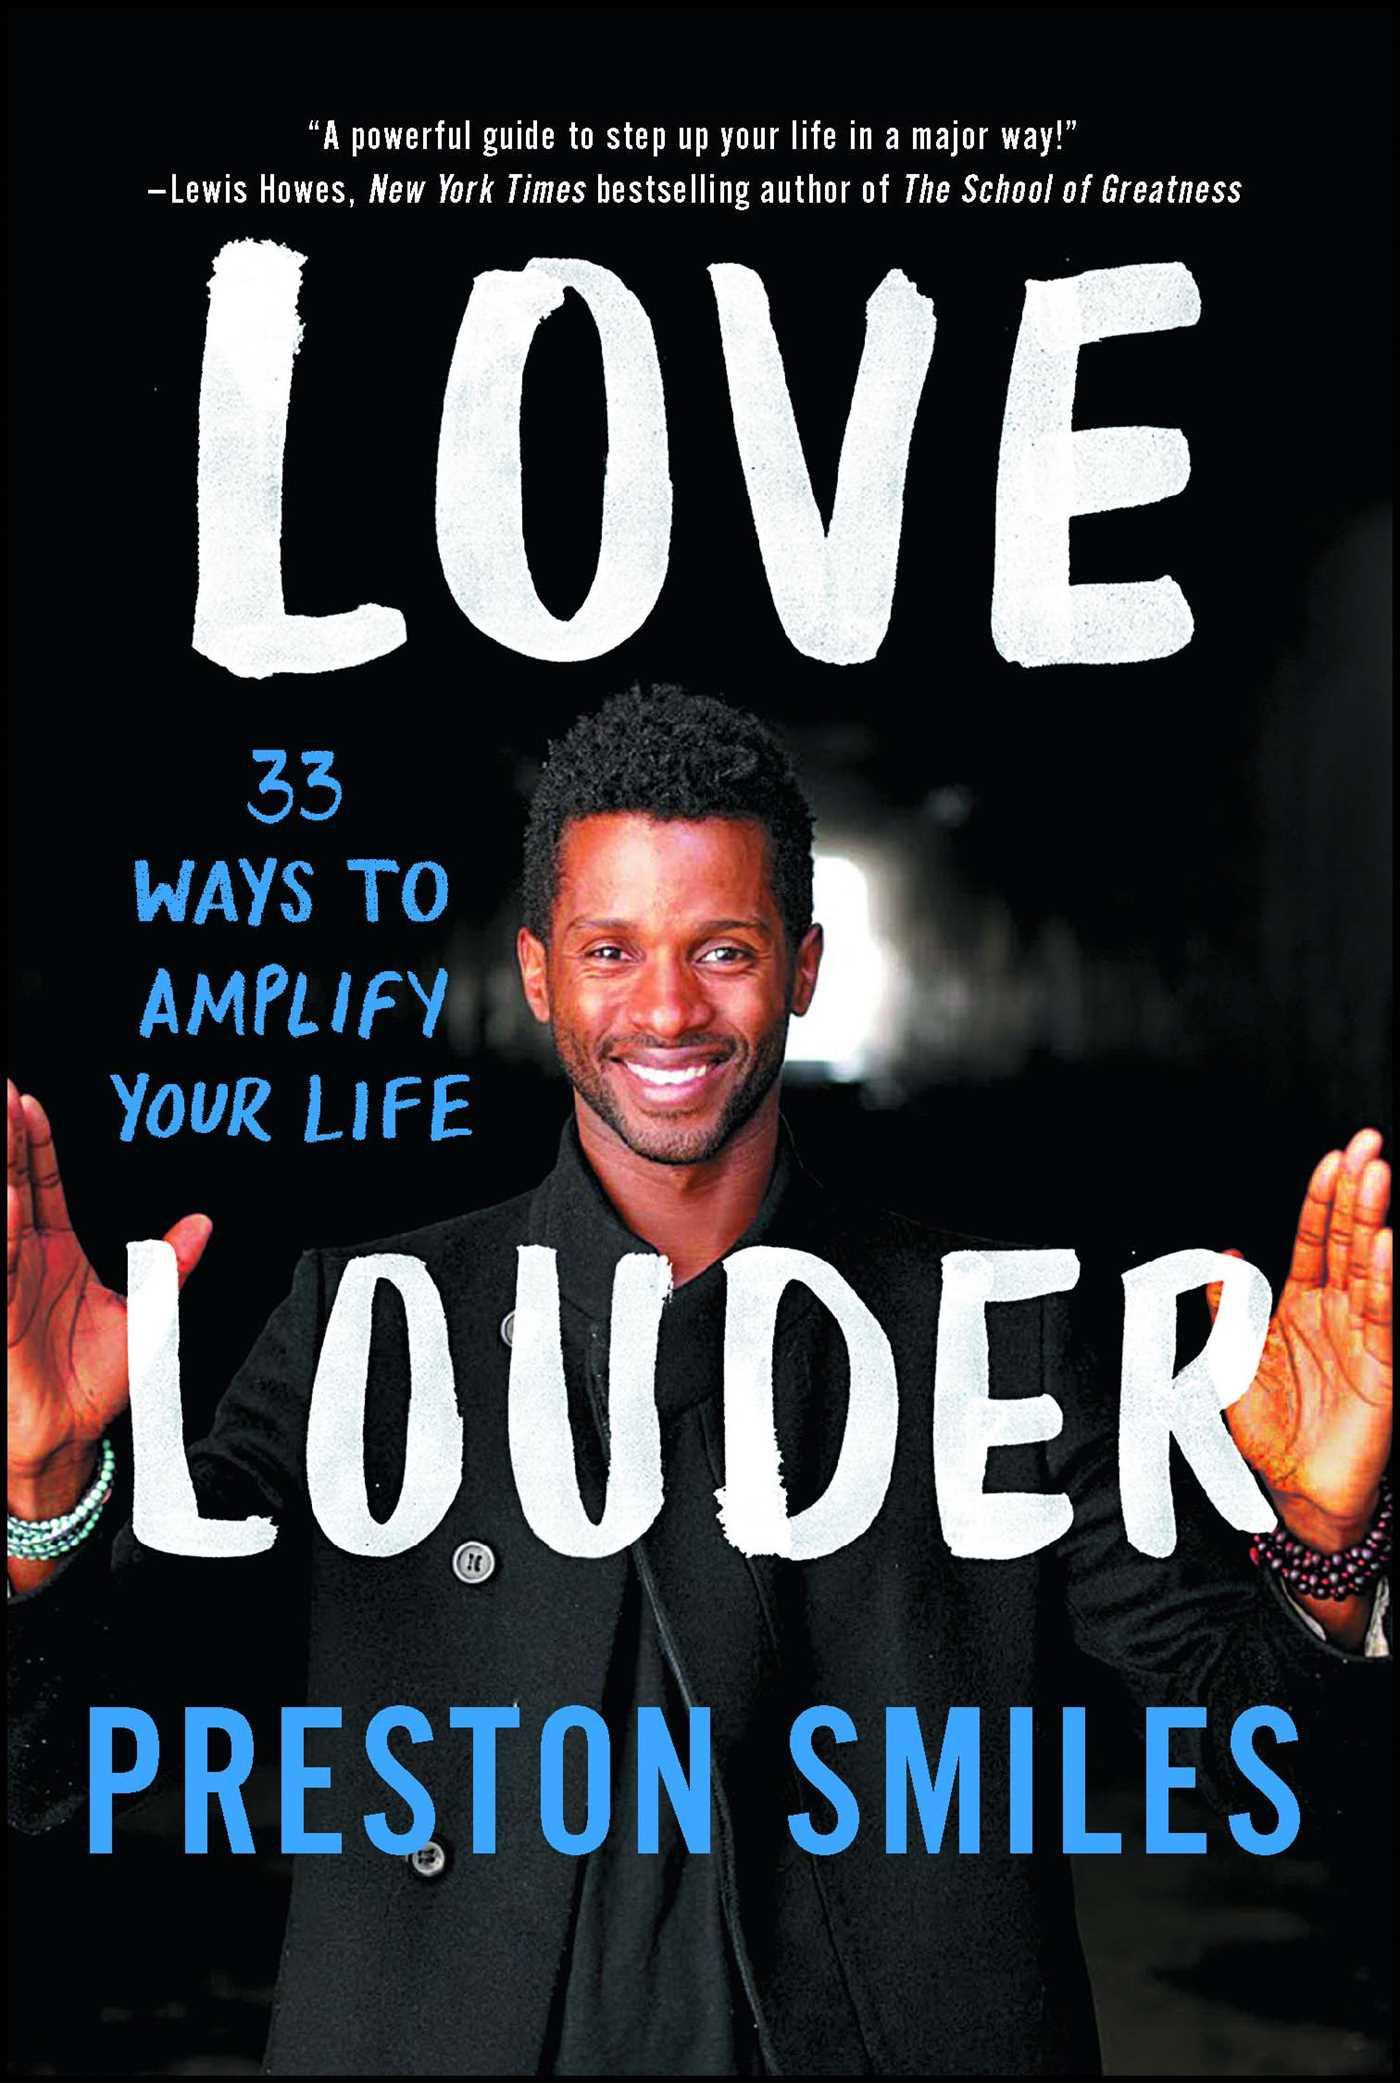 Love louder 9781501120152 hr